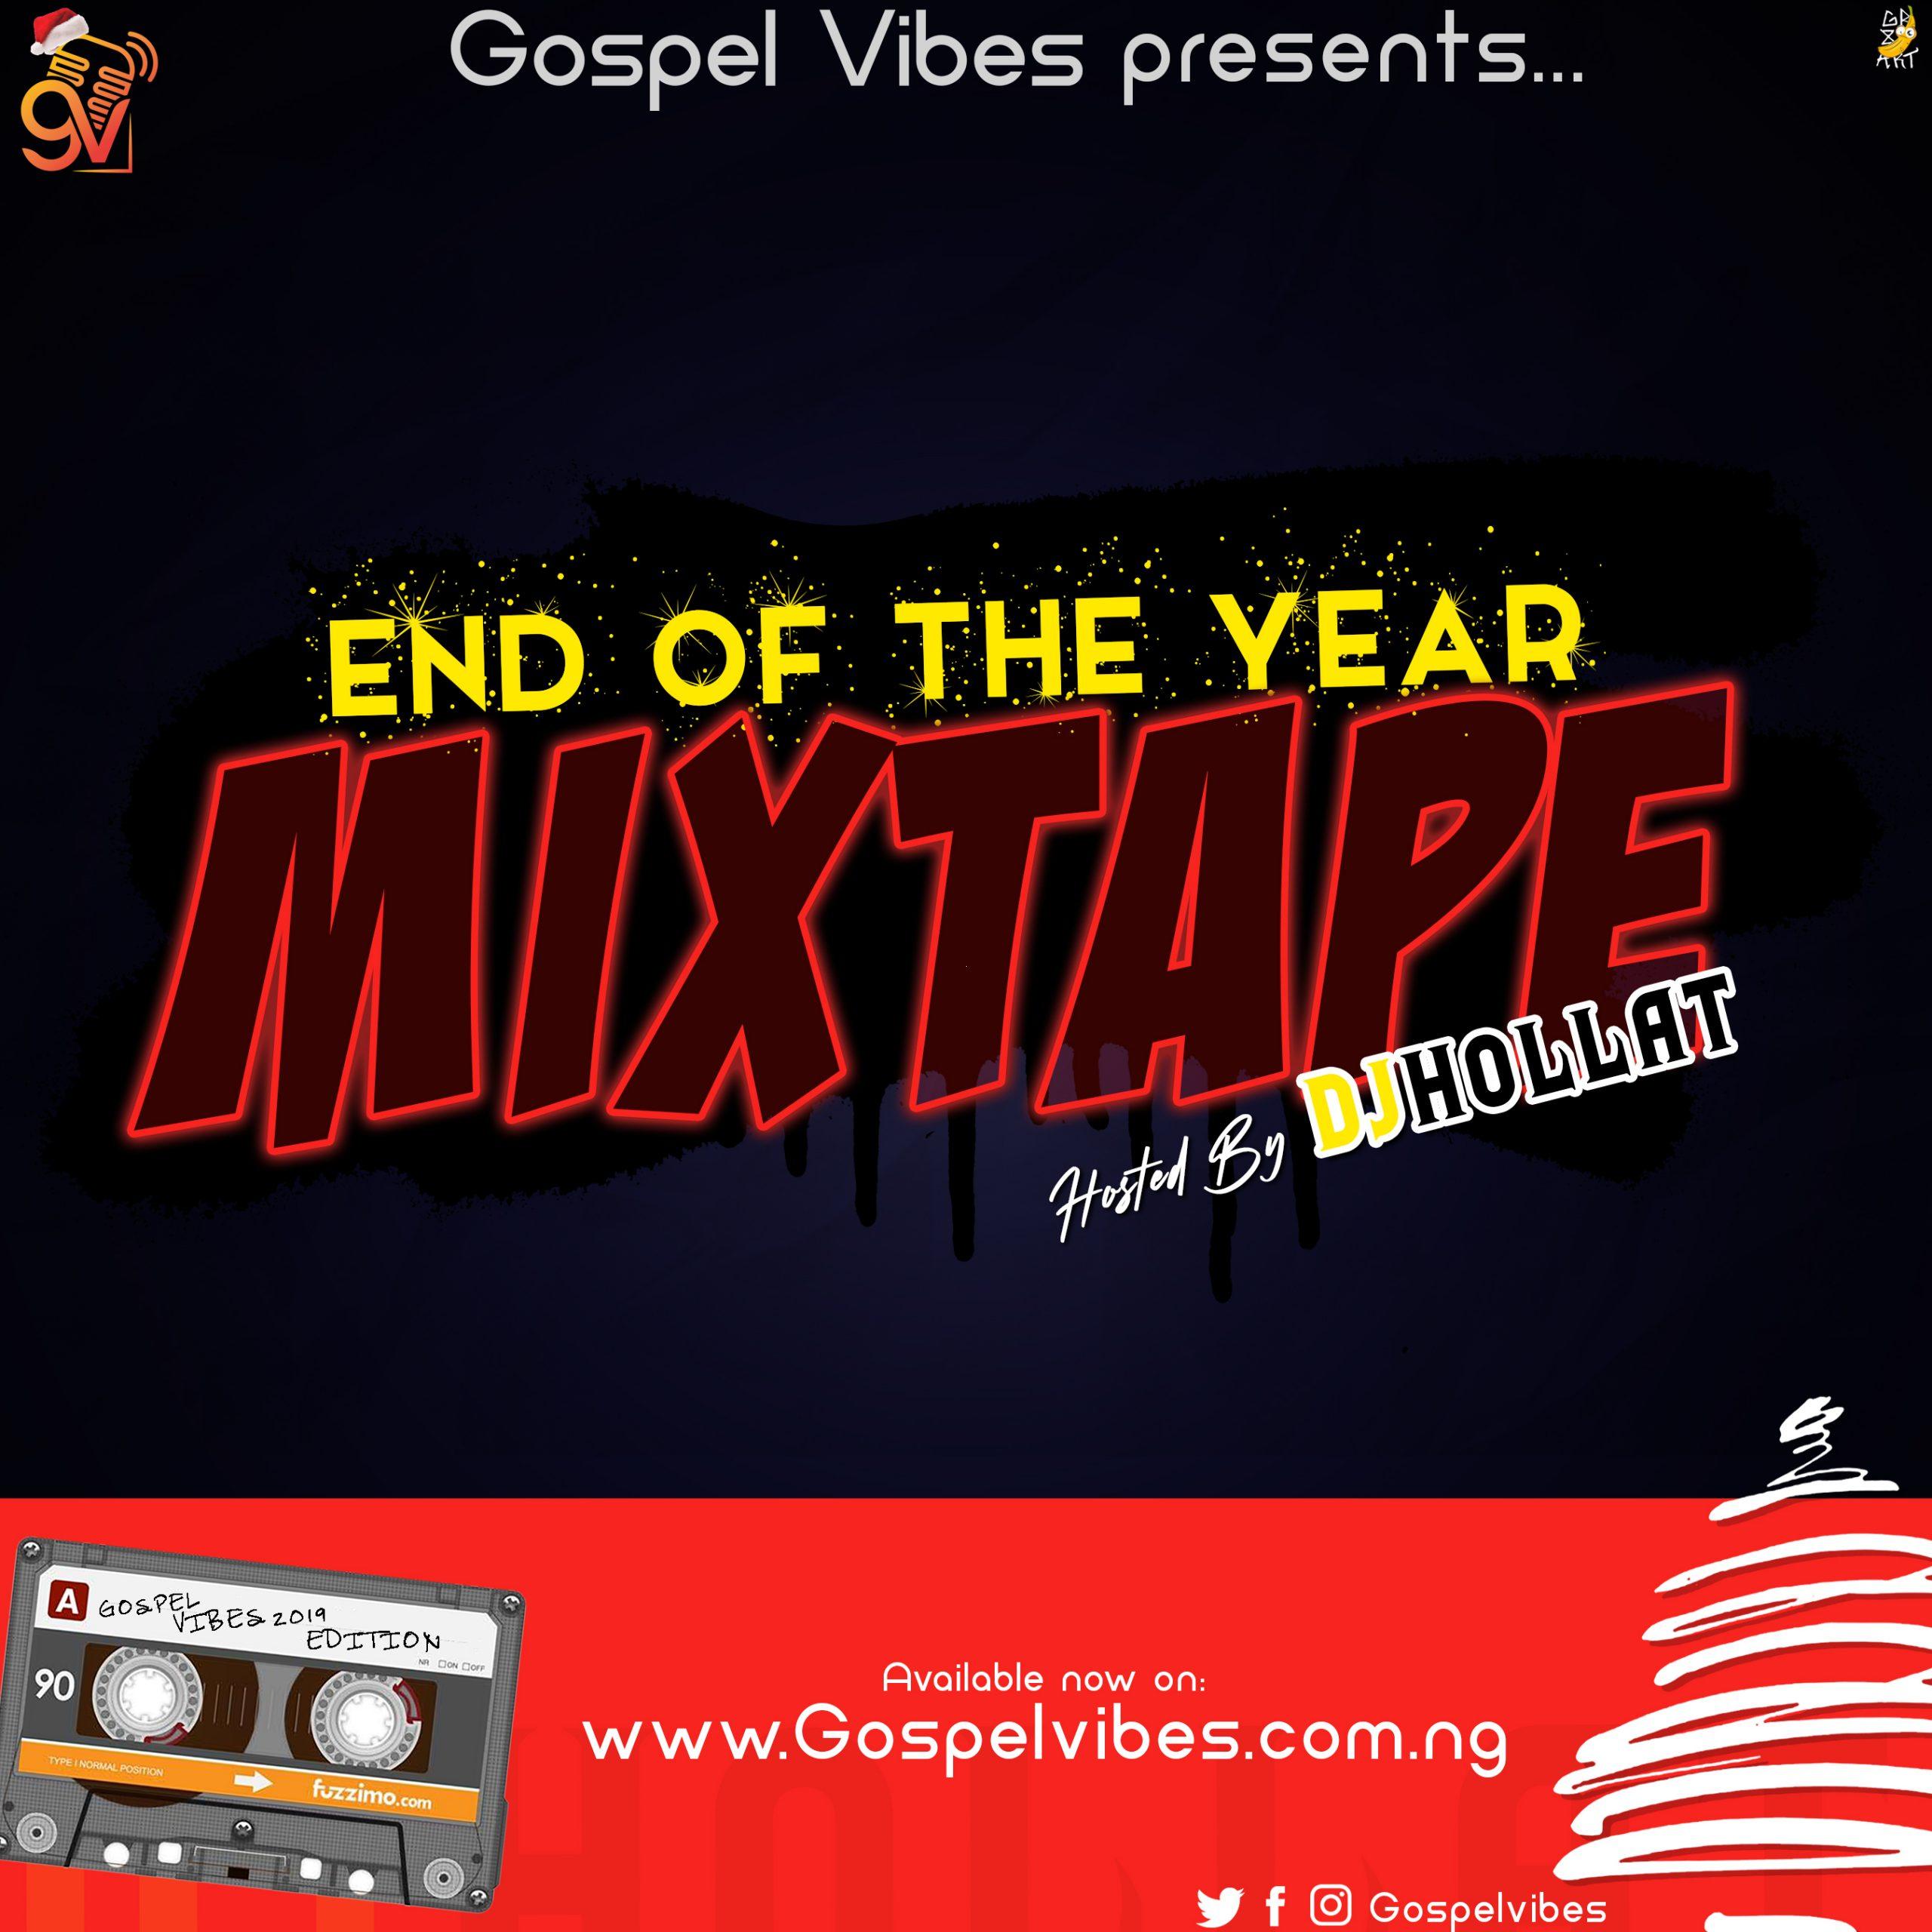 Gospel Vibes Ft. DJ Hollat - End Of The Year Mixtape